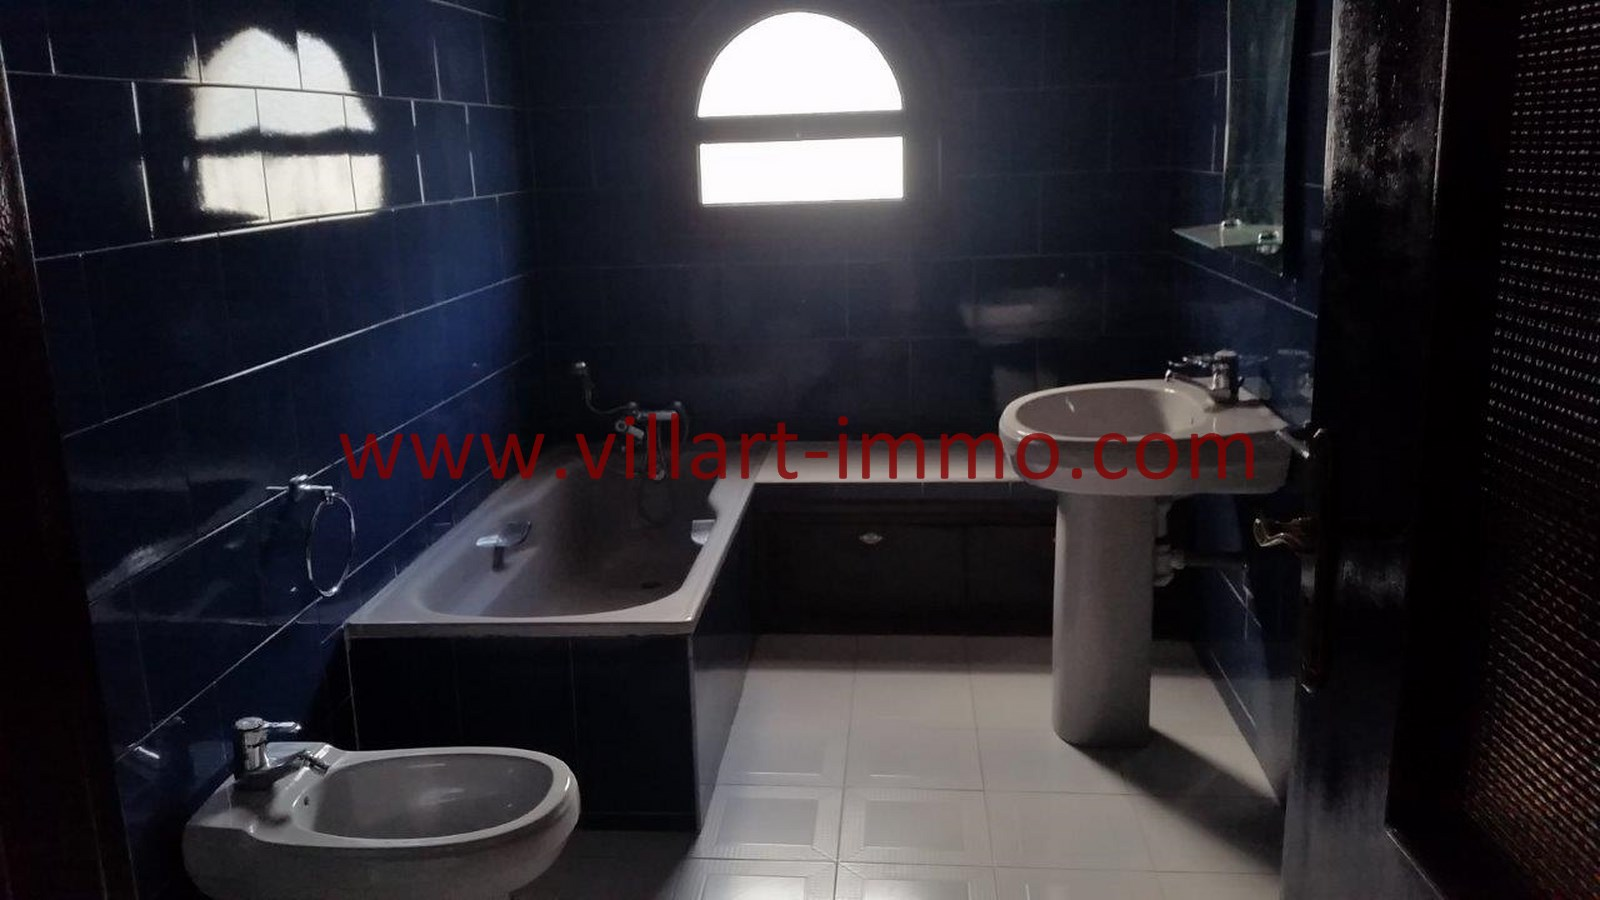 13-Vente-Villa-Tanger-Salle de bain 2-VV528-Villart Immo